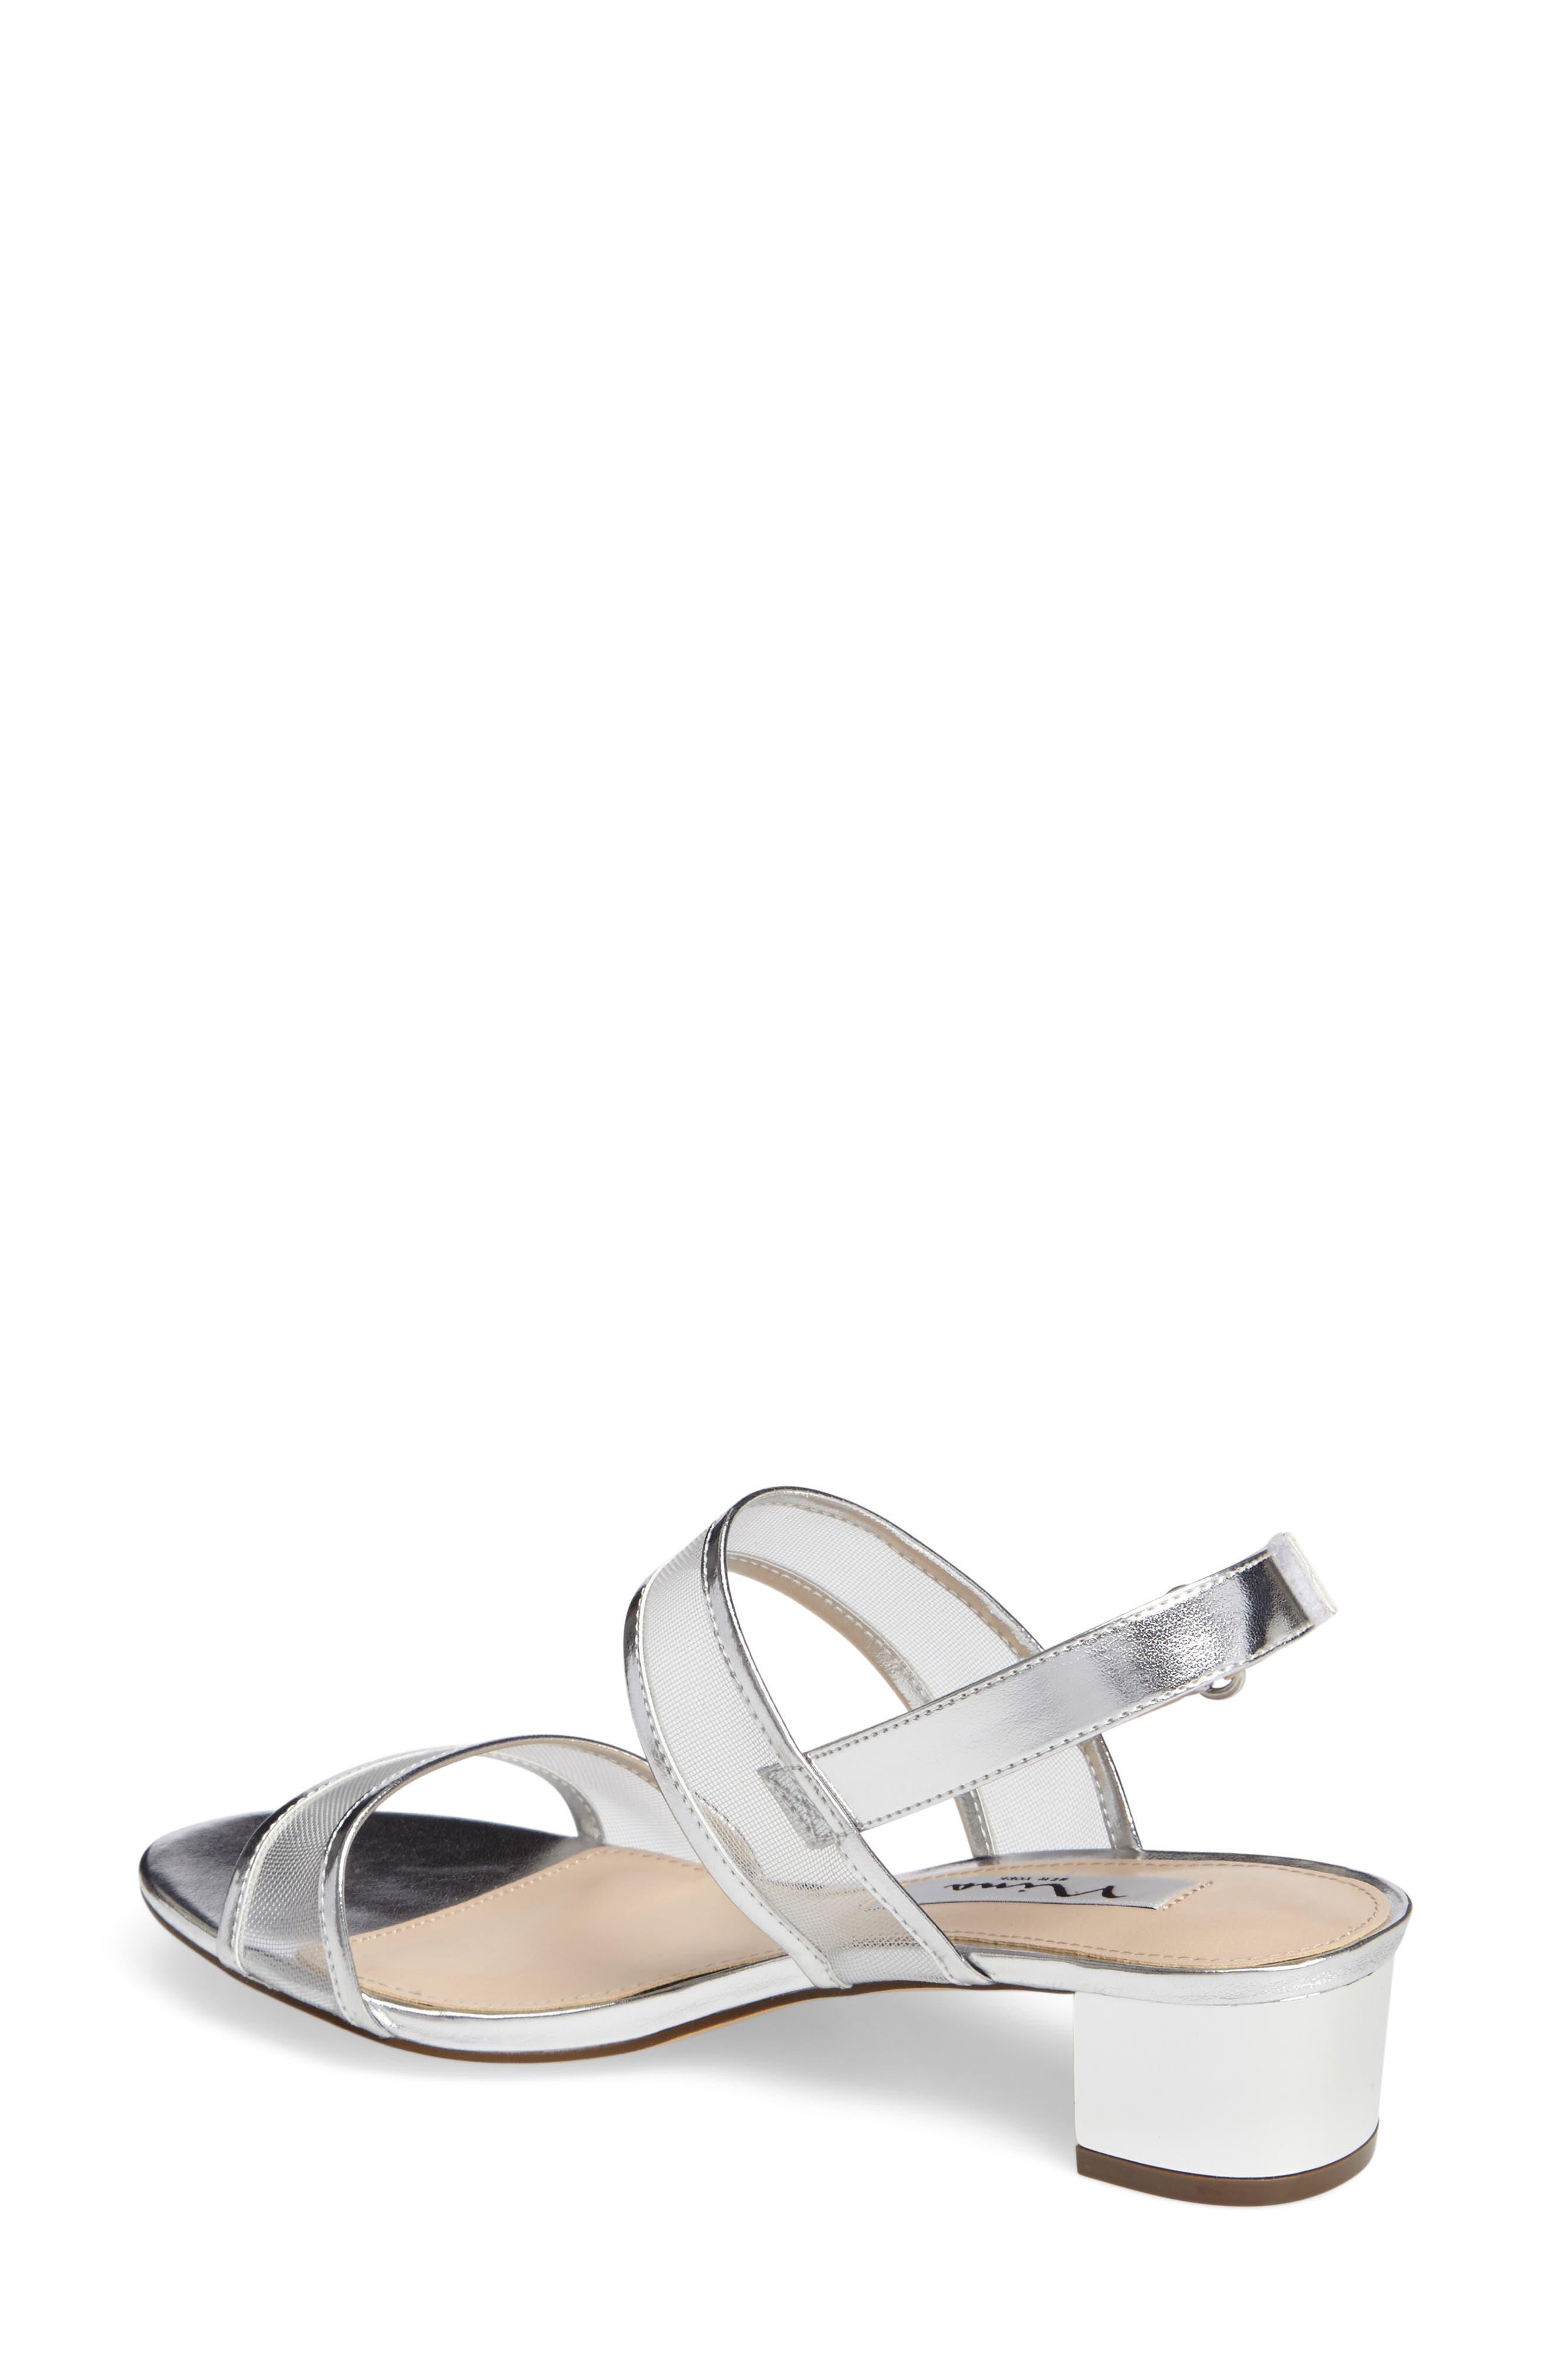 Ganice Mesh Strap Sandal,                             Alternate thumbnail 2, color,                             Silver Faux Leather